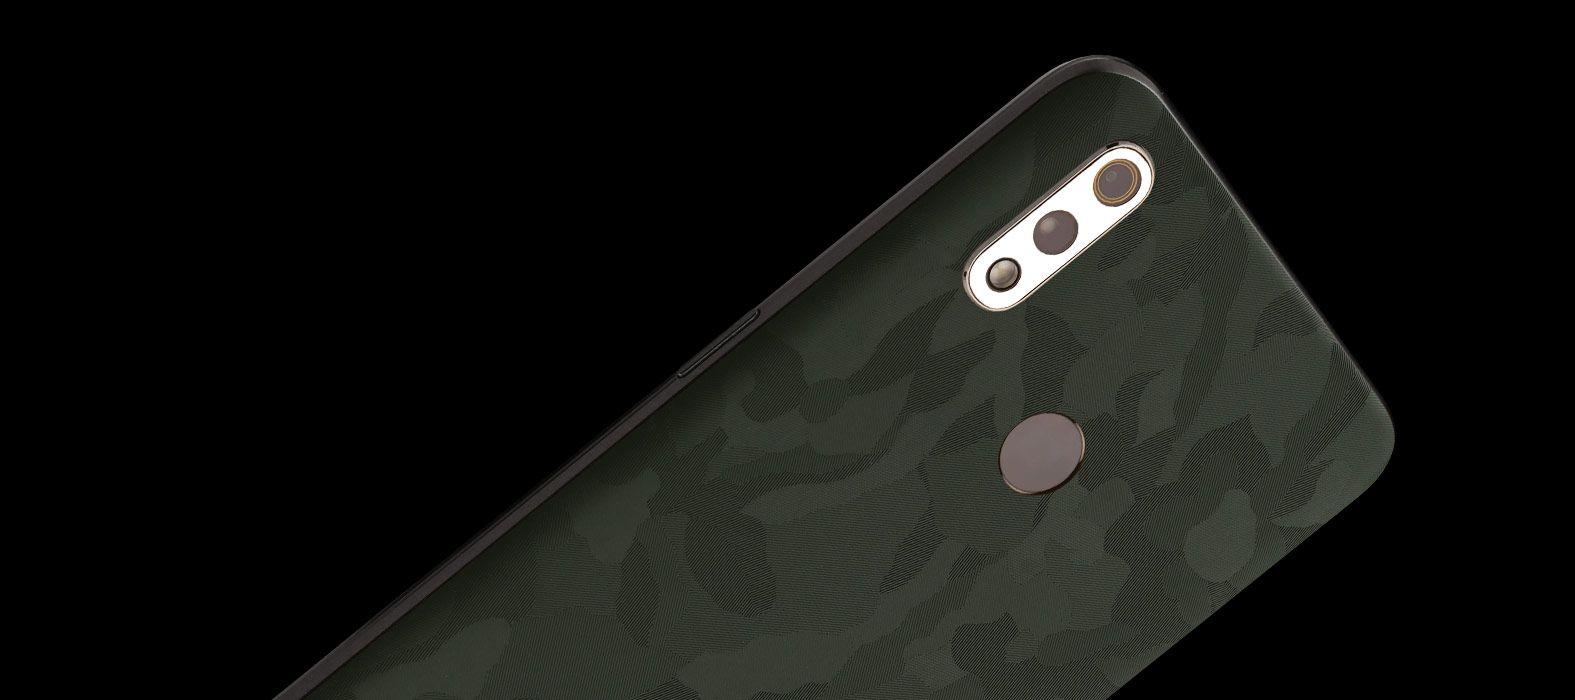 Realme-3-Pro_Green-Camo_Skins